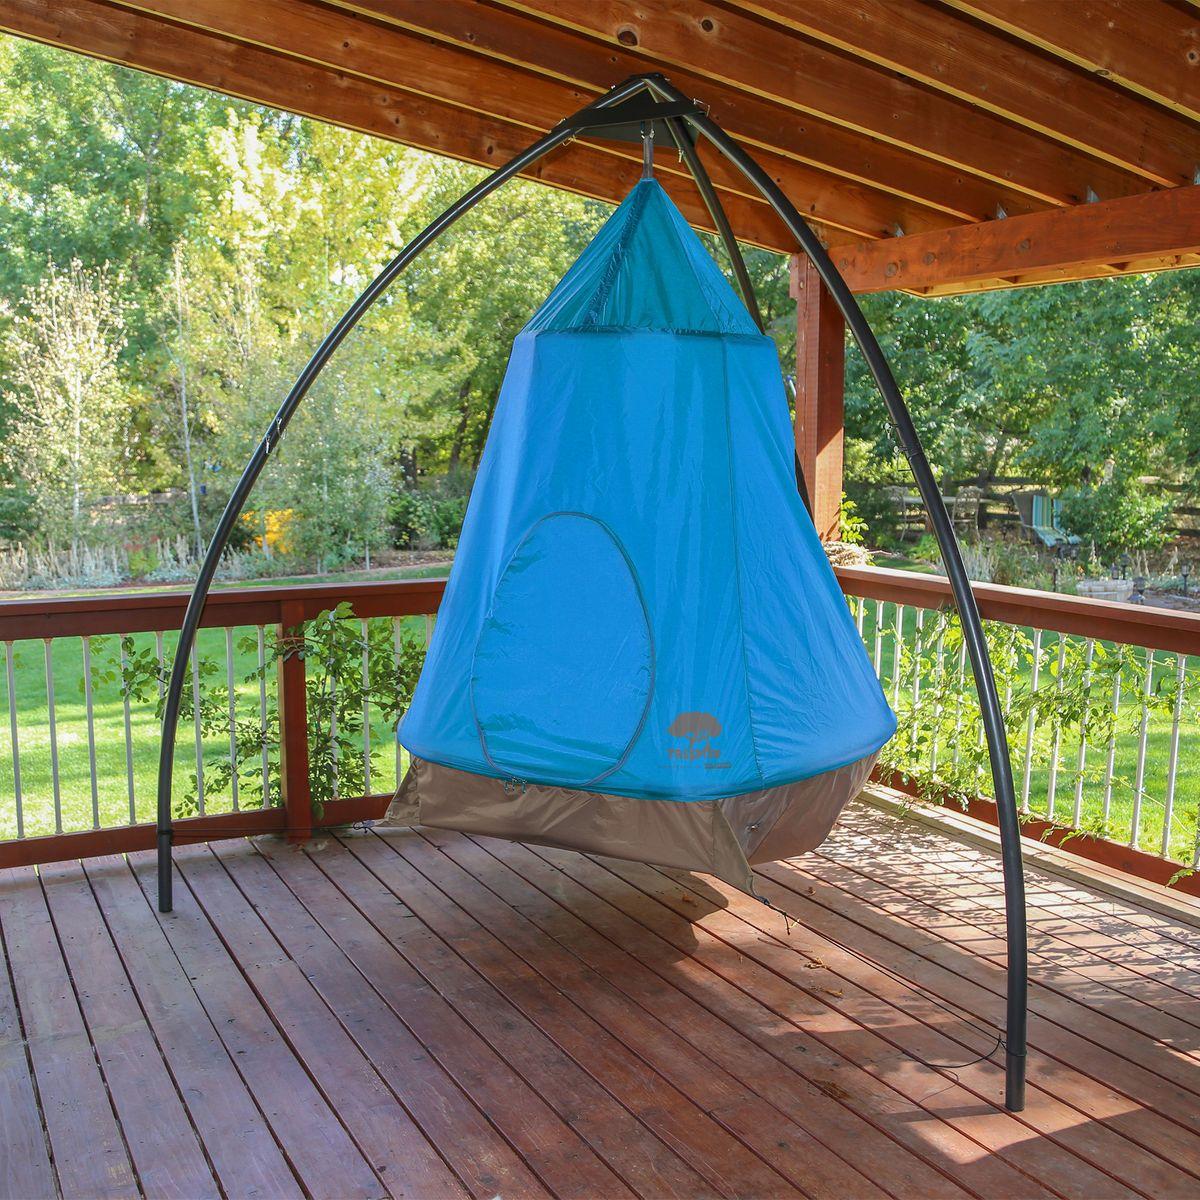 Treepod Portable Hanging Tree House Stand 961253 Gander